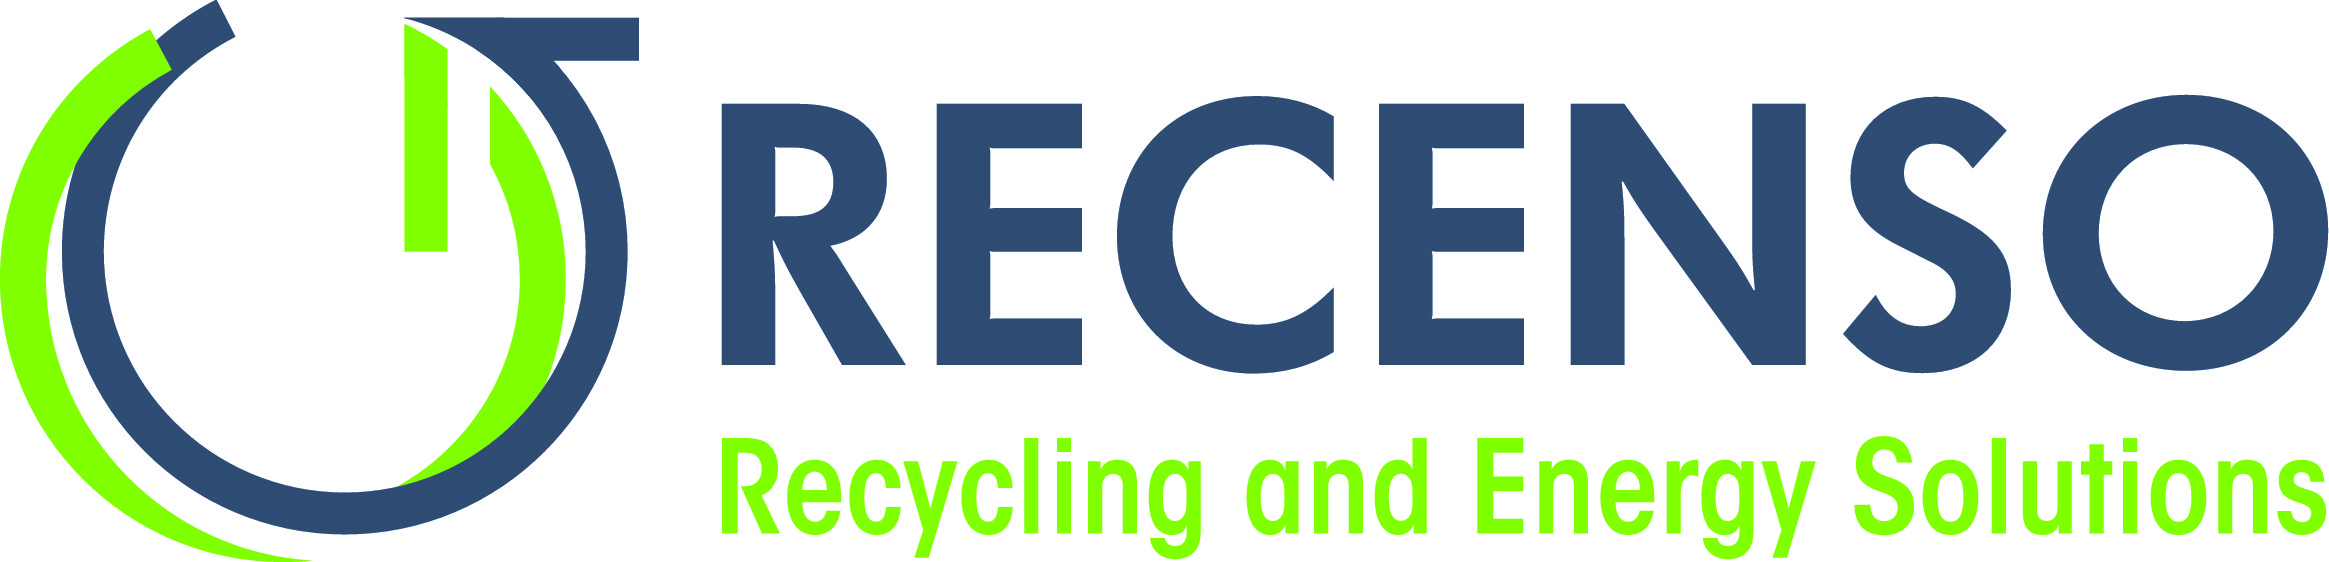 https://europeanplasticspact.org/wp-content/uploads/2020/03/RECENSO-GmbH.jpg